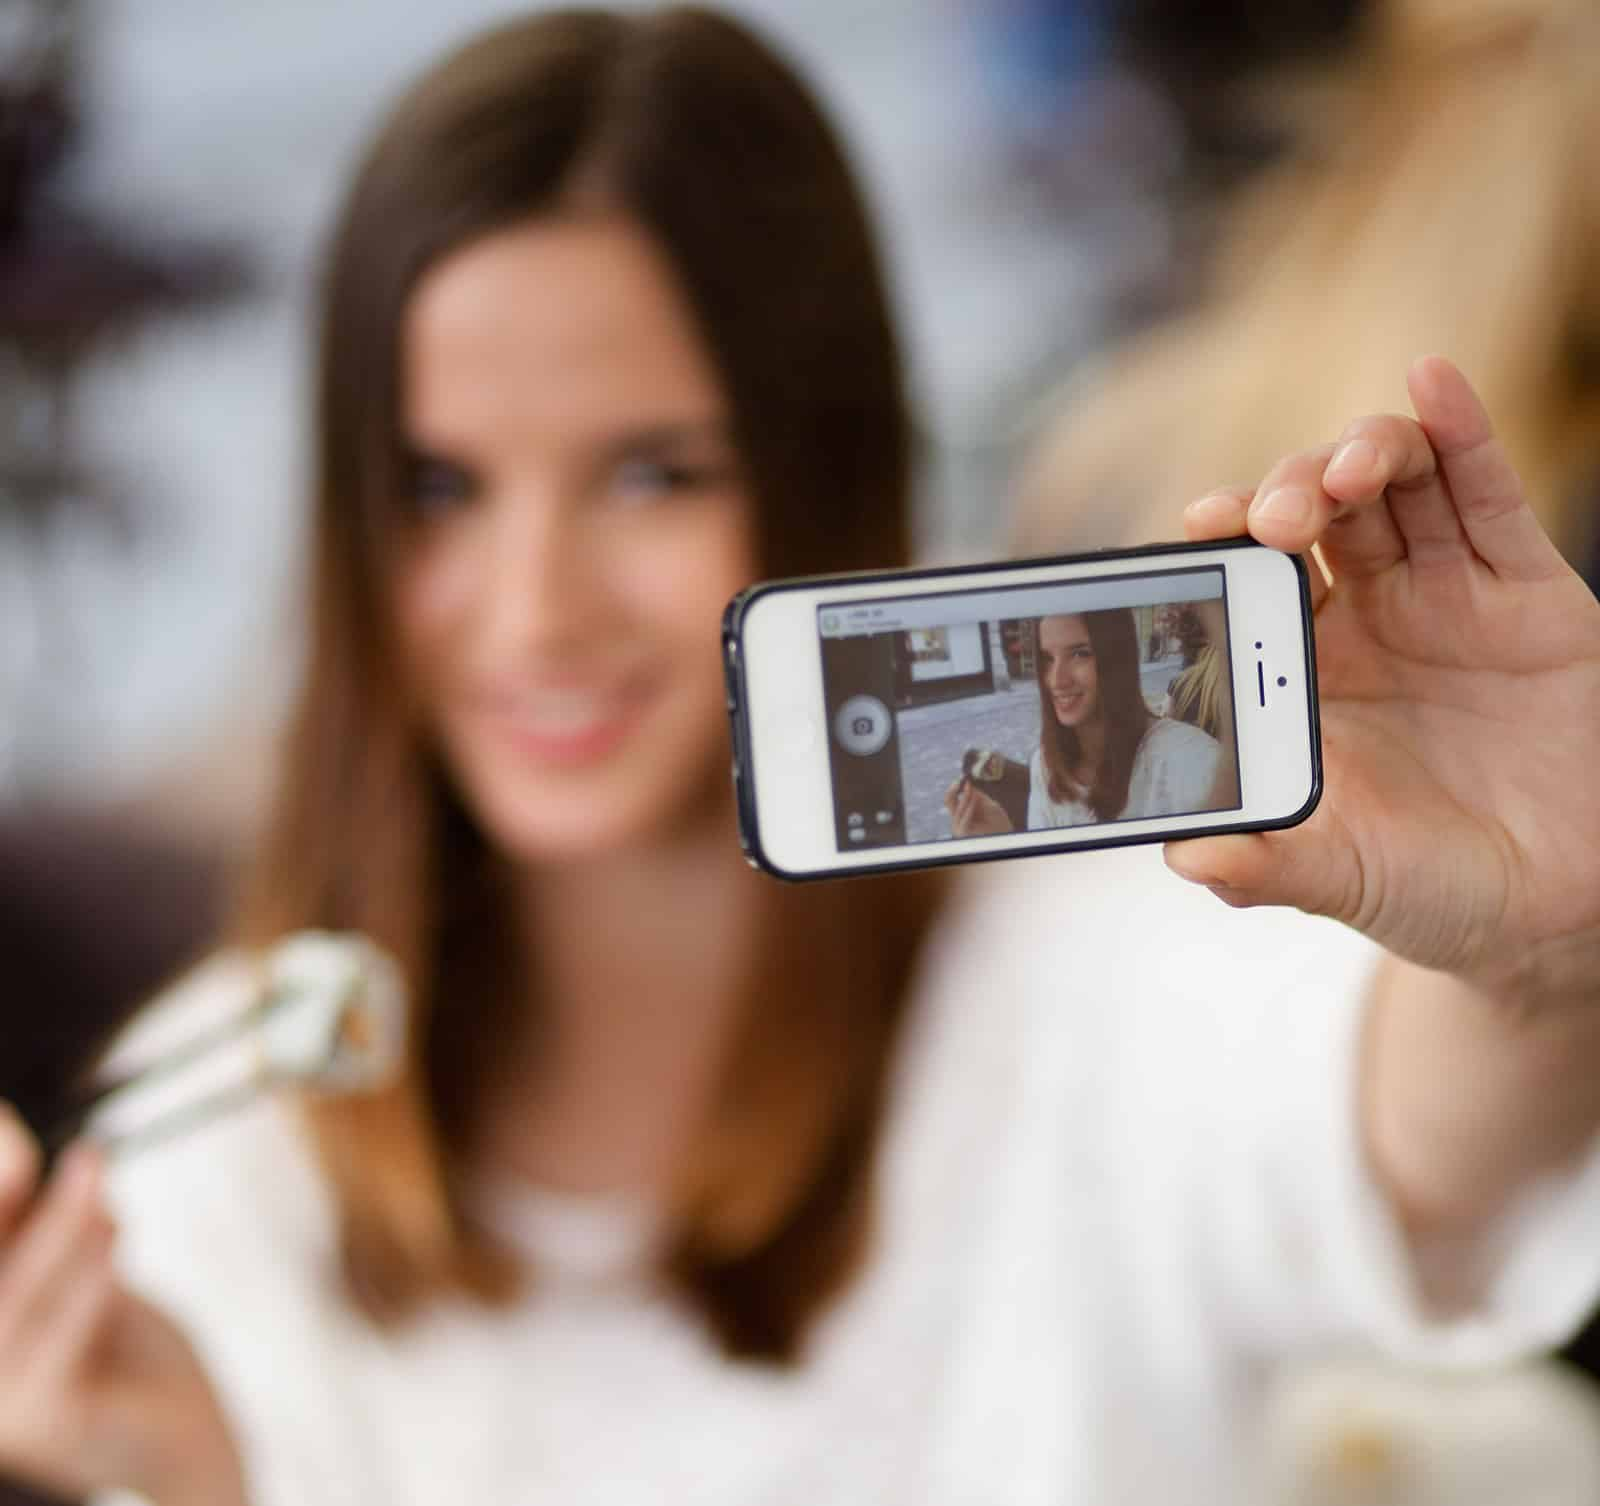 Photomonials Process - Take a Selfie